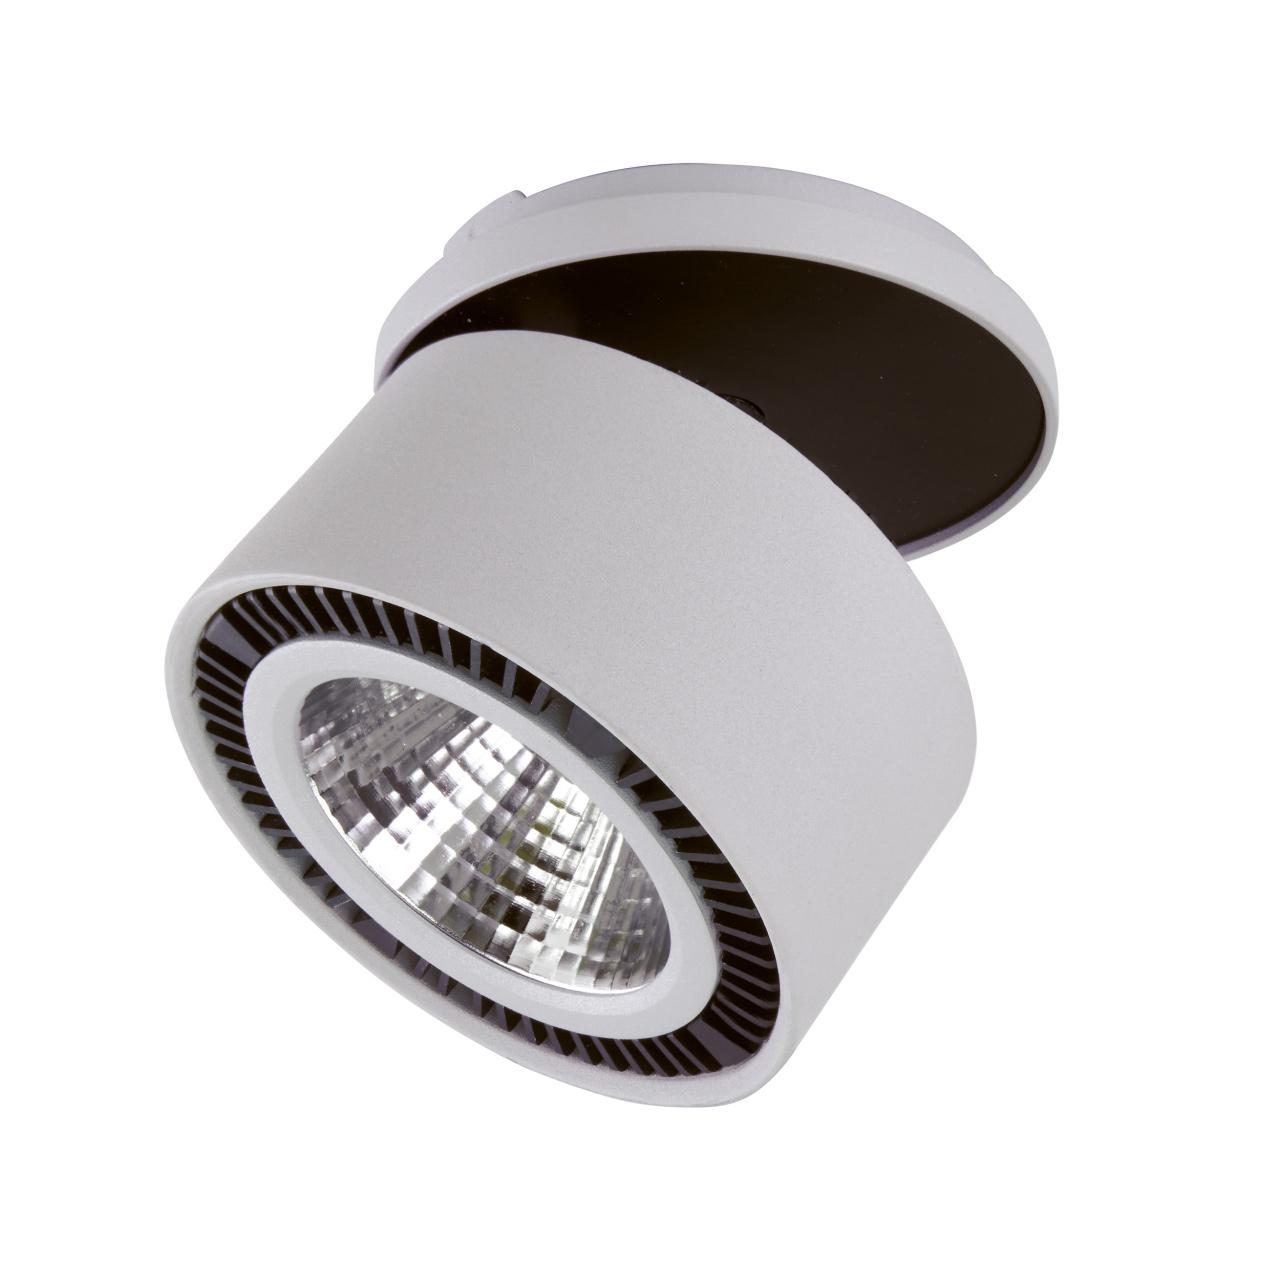 Светильник Forte inca LED 26W 1950LM 30G белый 3000K Lightstar 213820